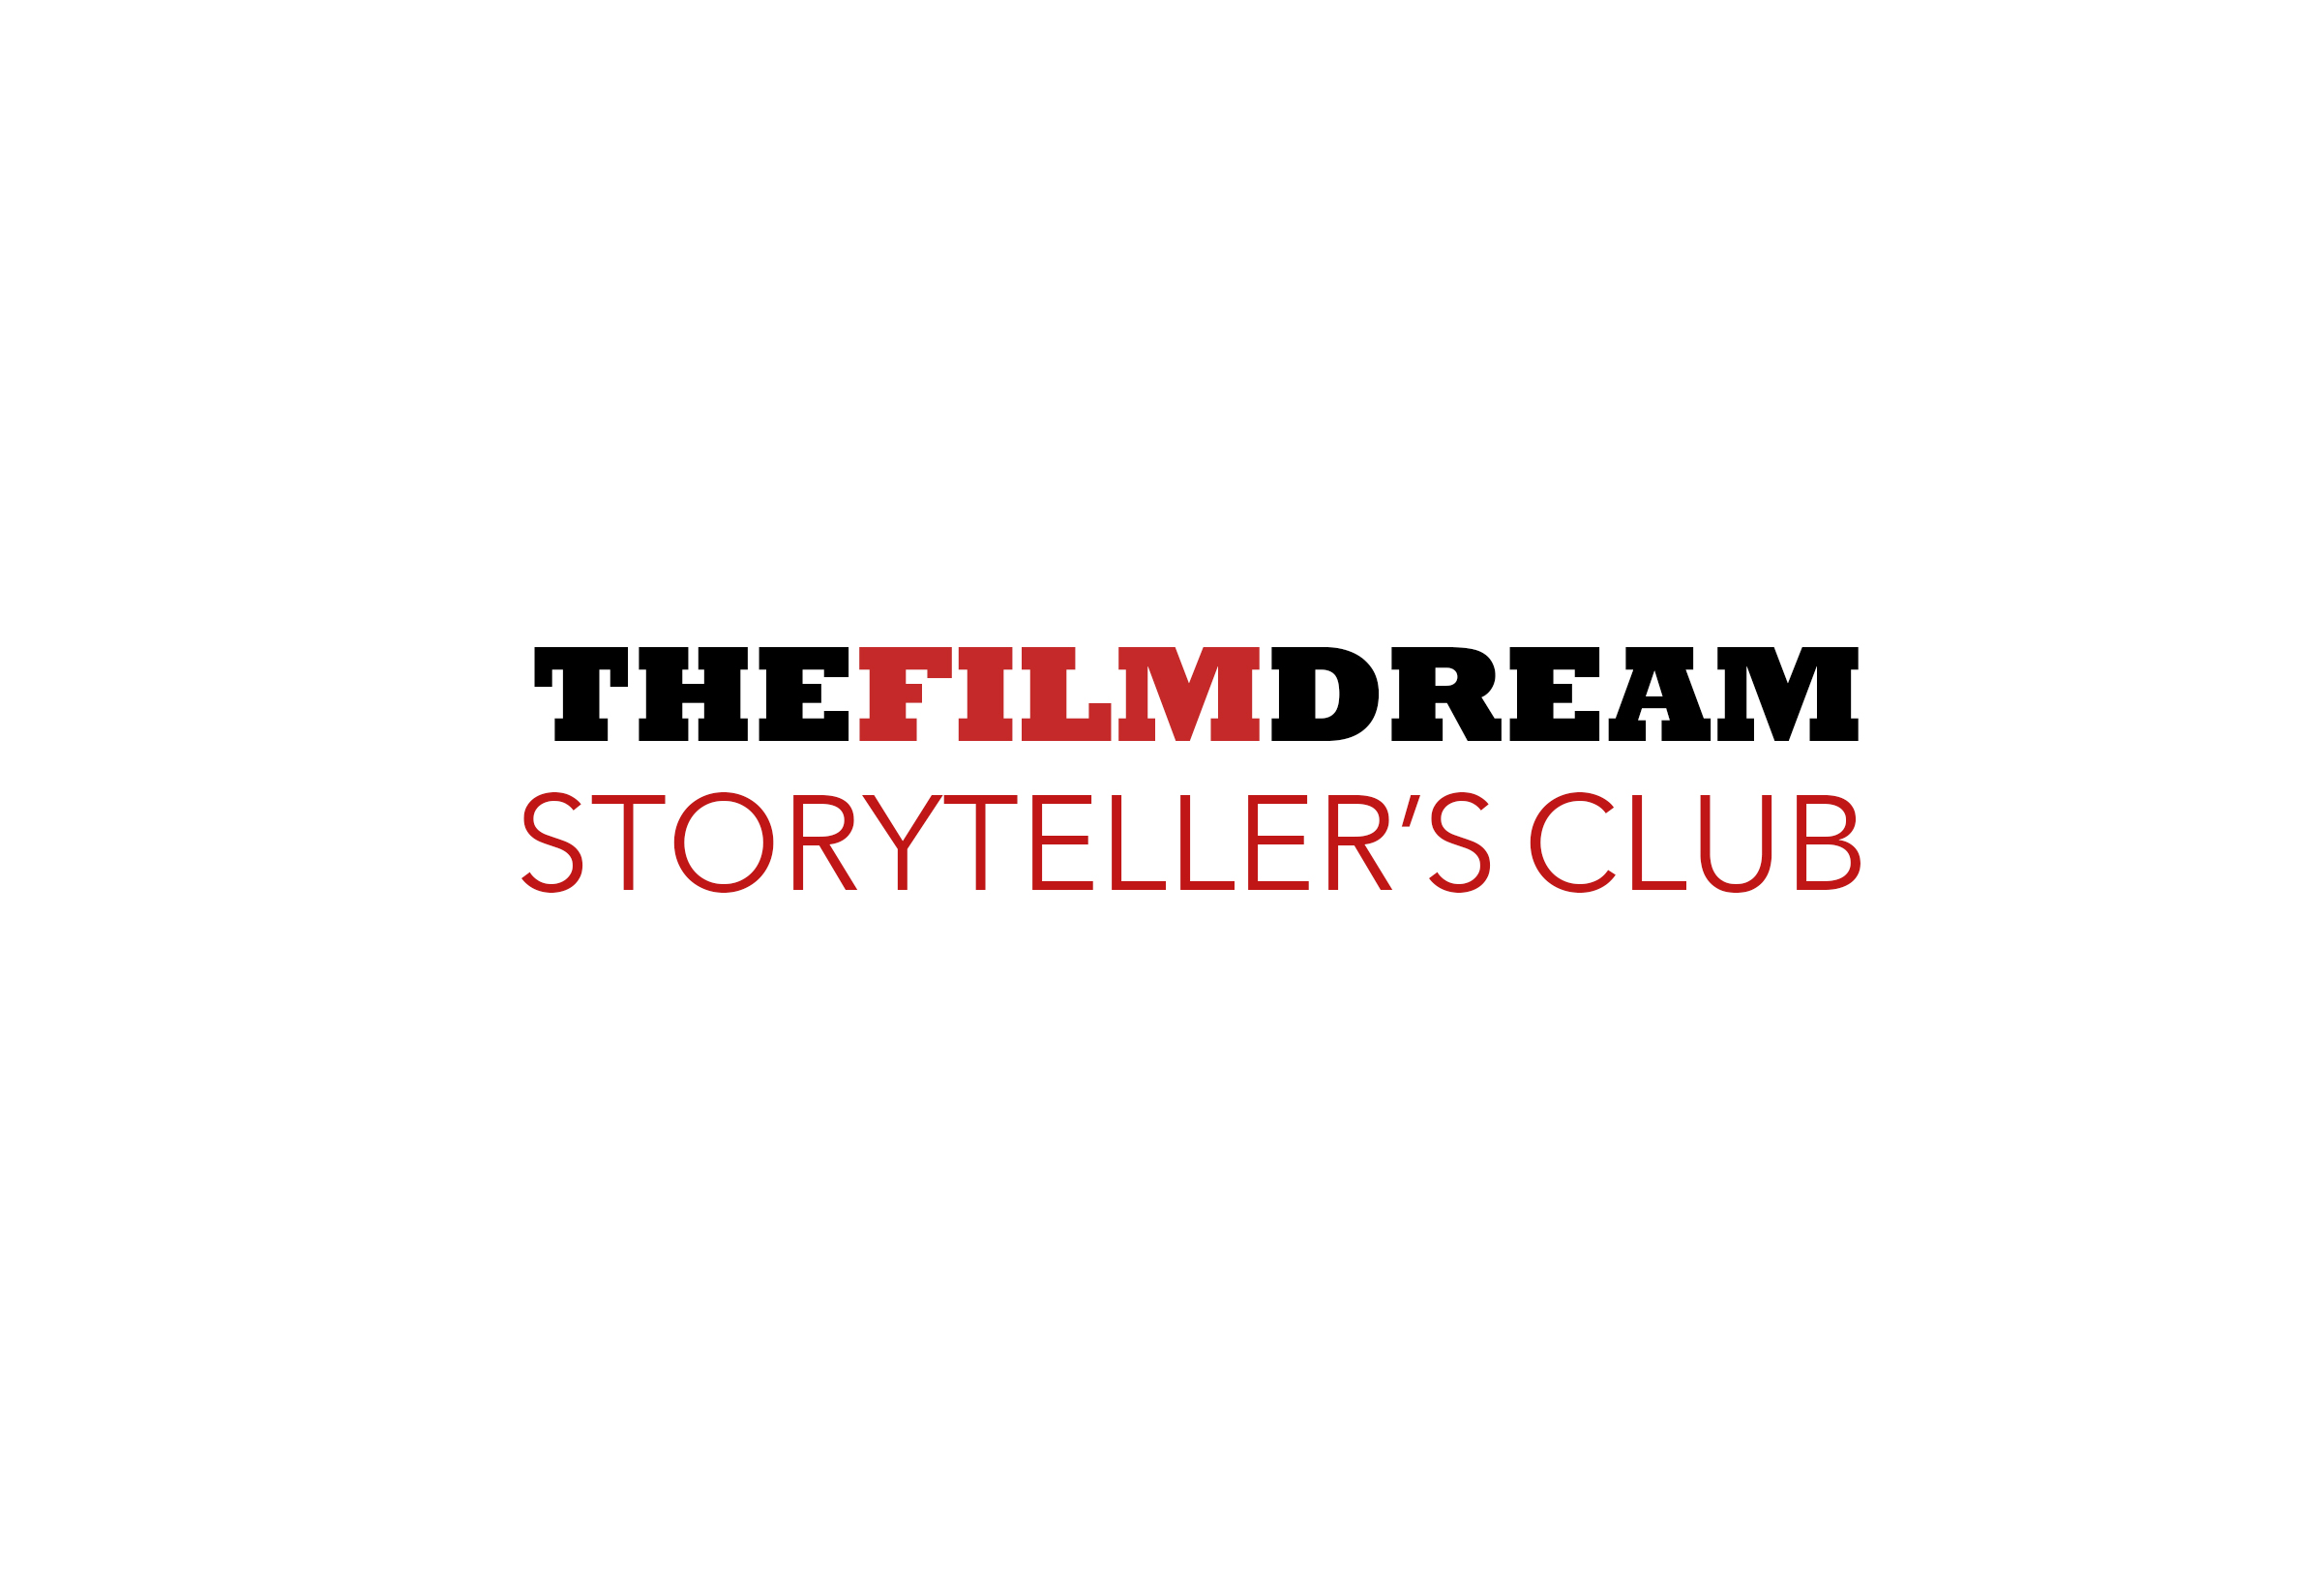 THE FILM DREAM STORYTELLERS CLUB